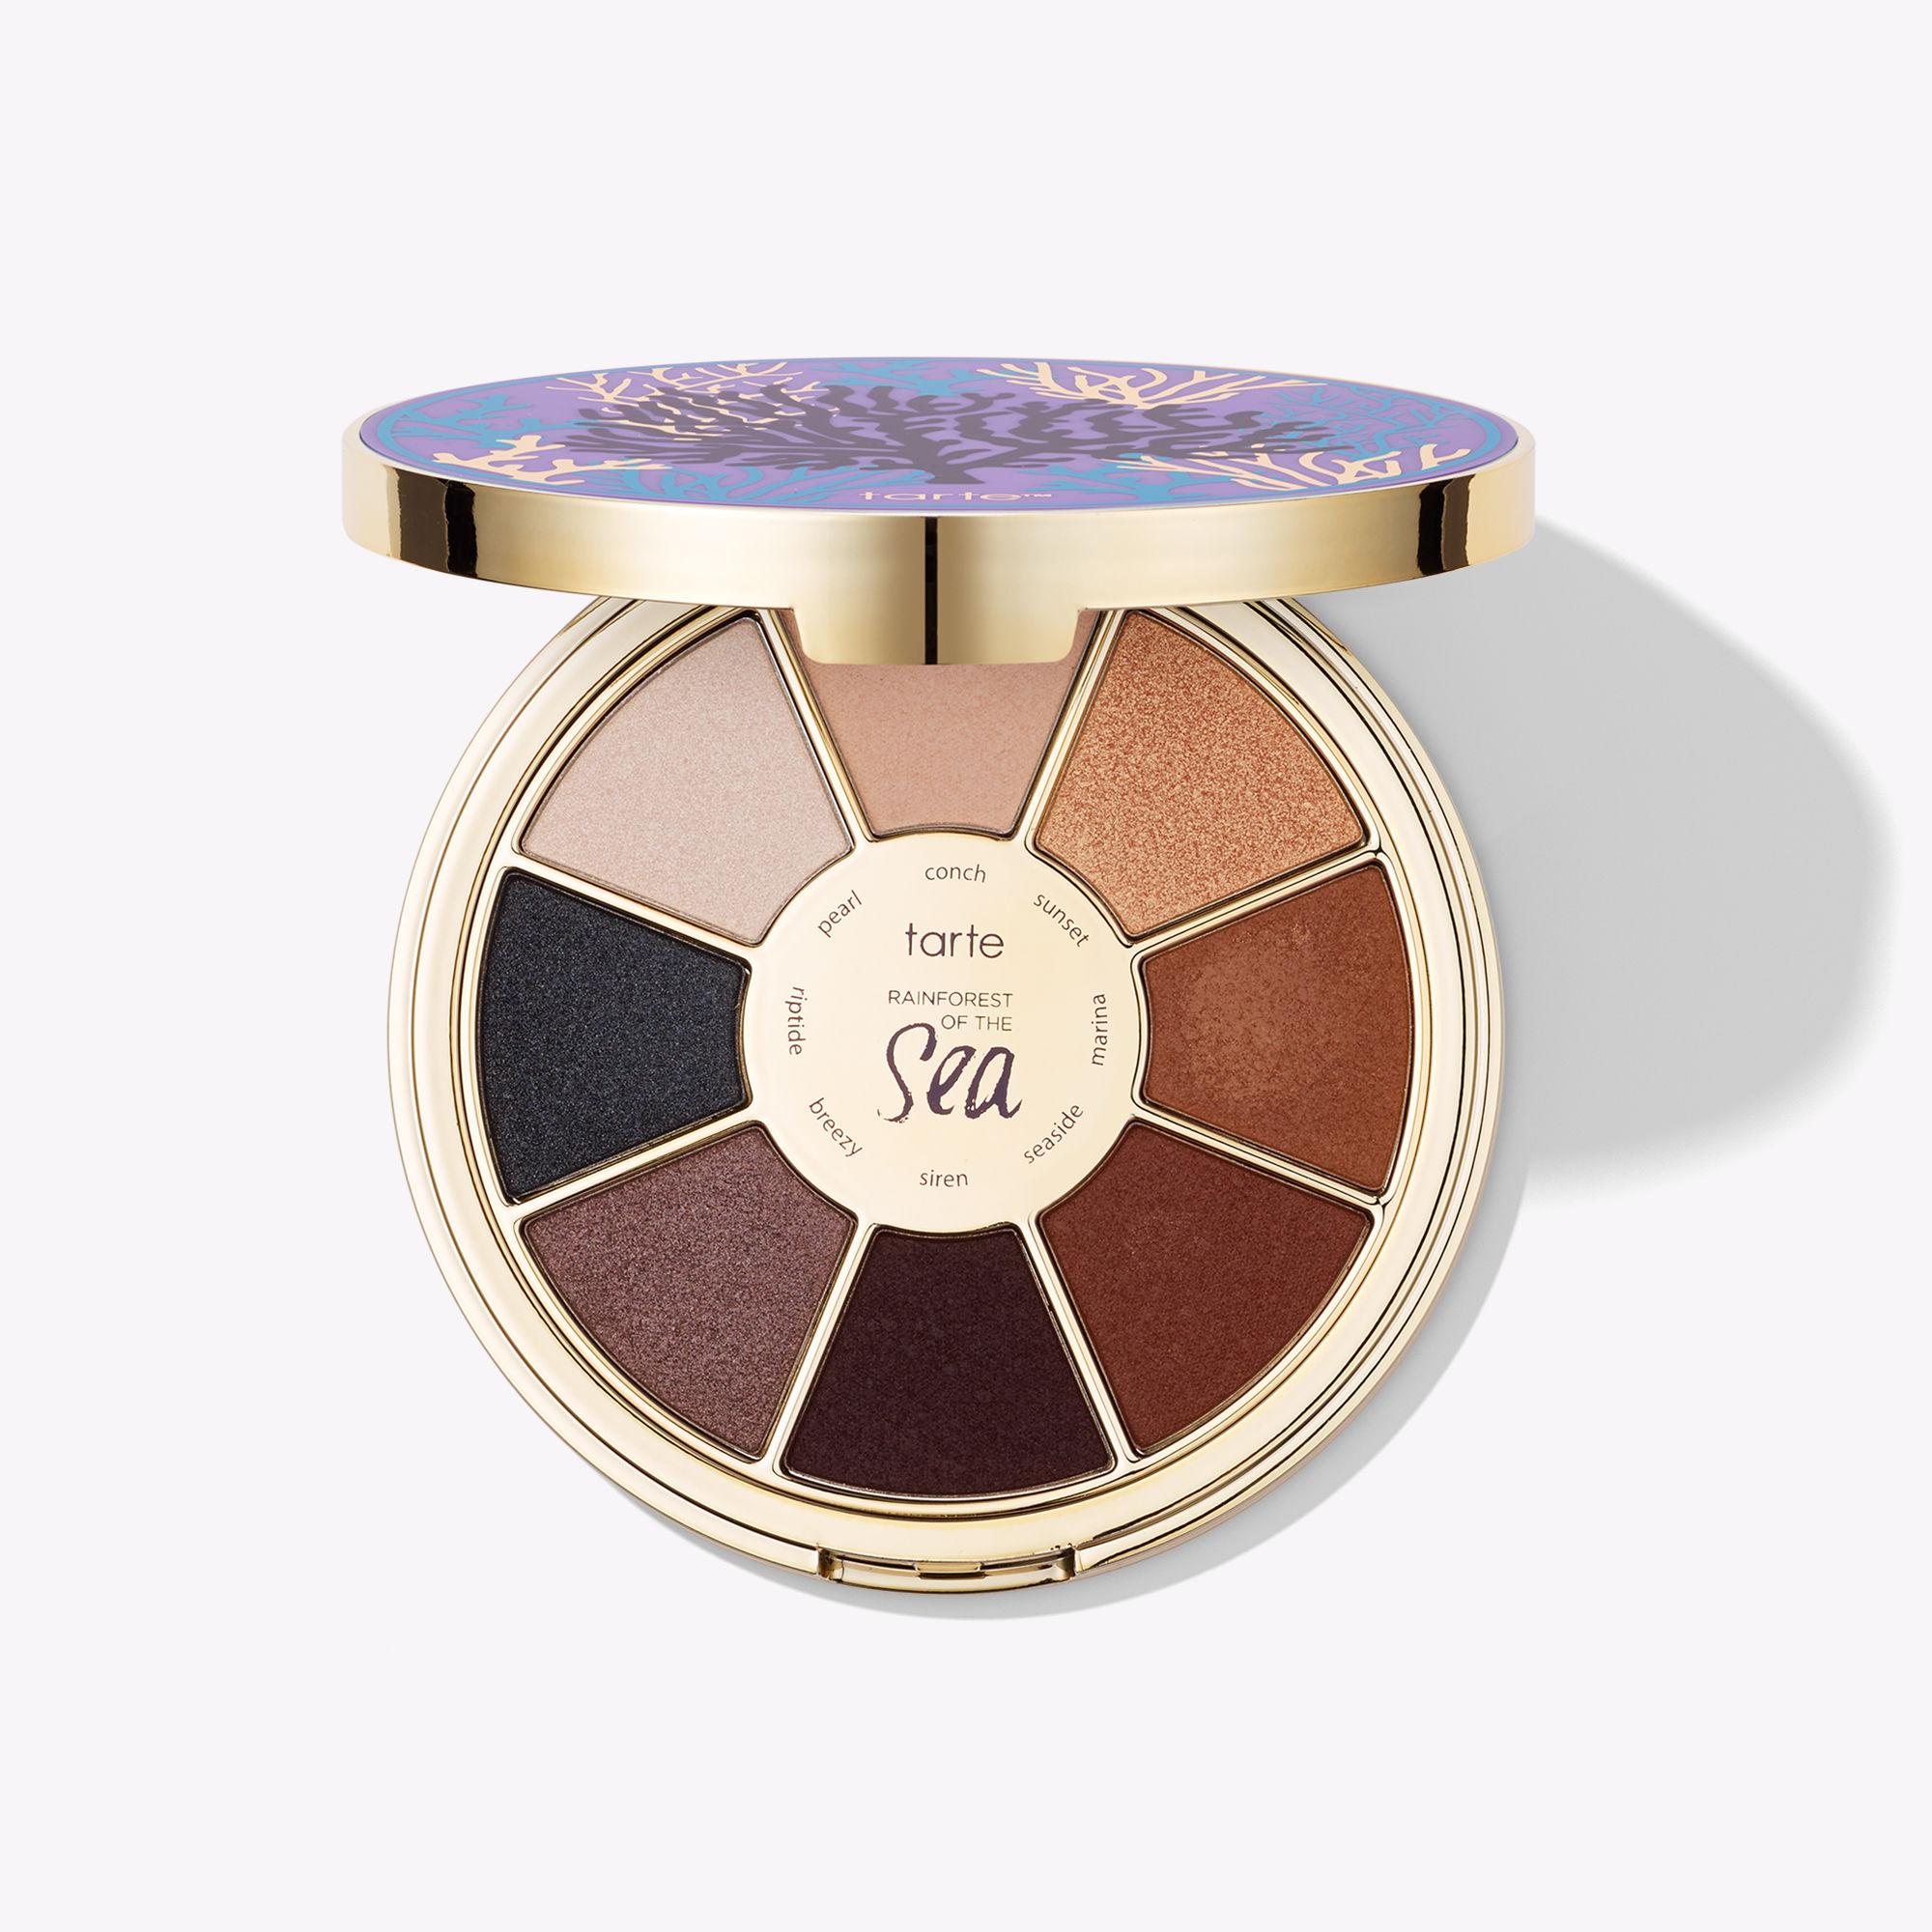 tarte™ Rainforest of the Sea™ eyeshadow palette vol. II